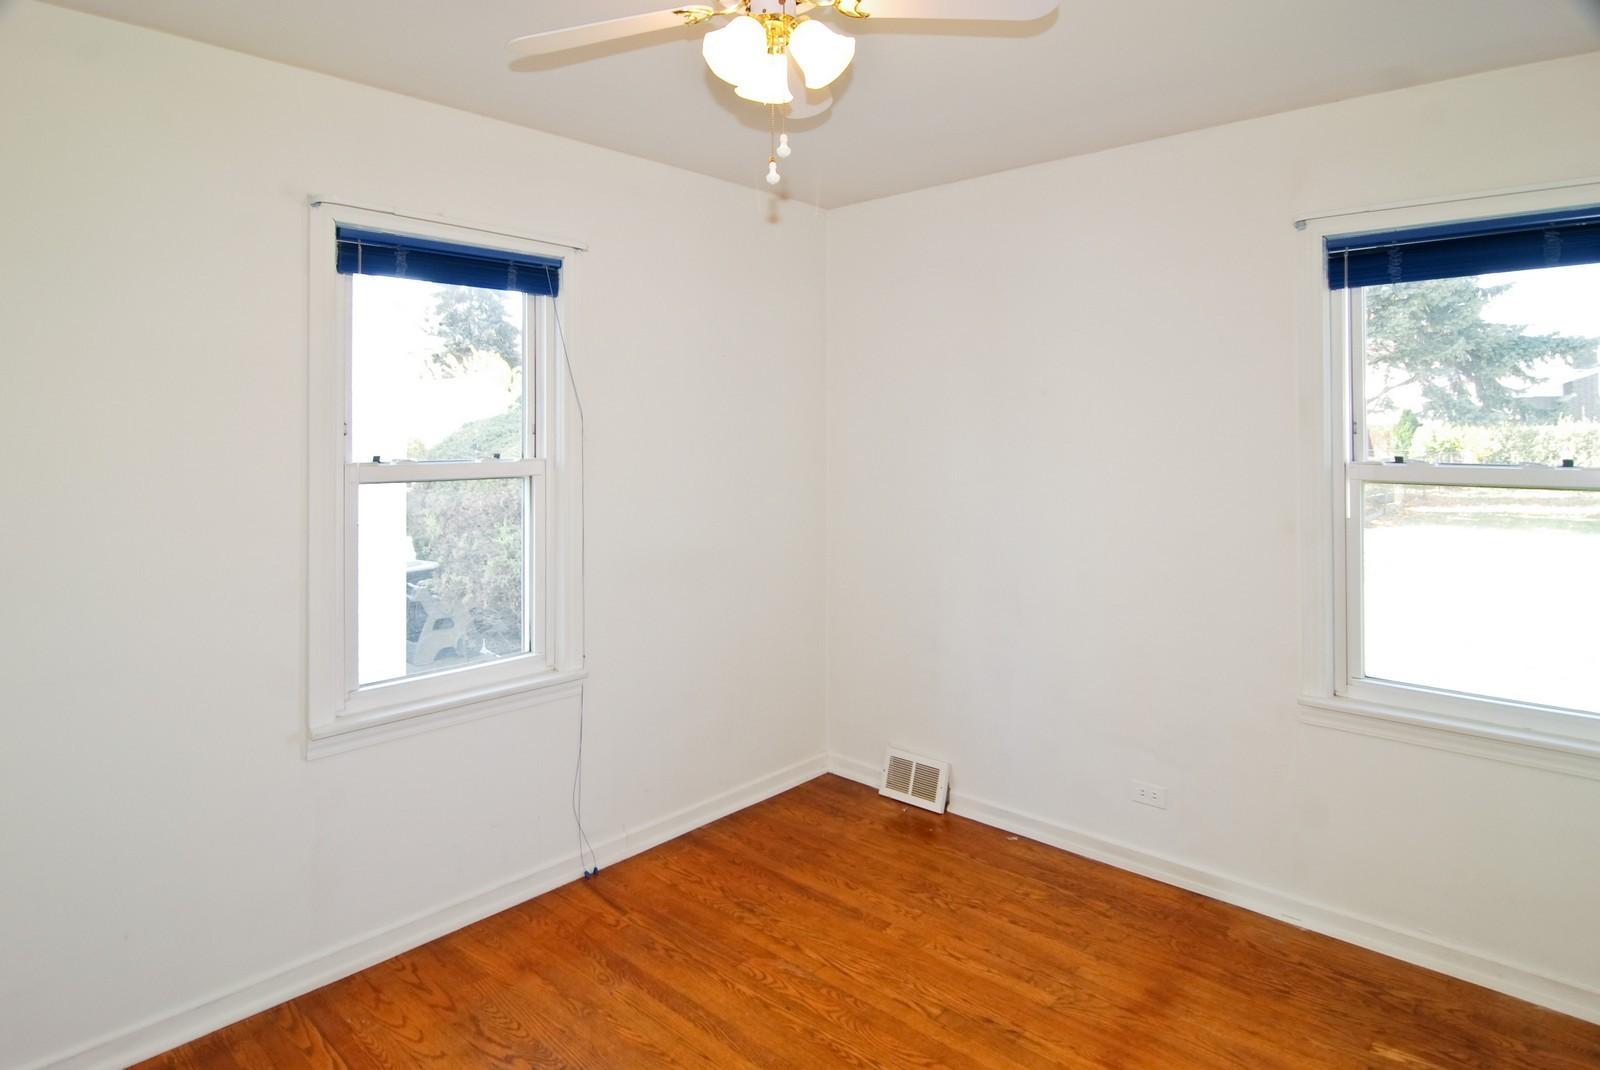 Real Estate Photography - 1526 Hillside Ave, Berkeley, IL, 60163 - Master Bedroom